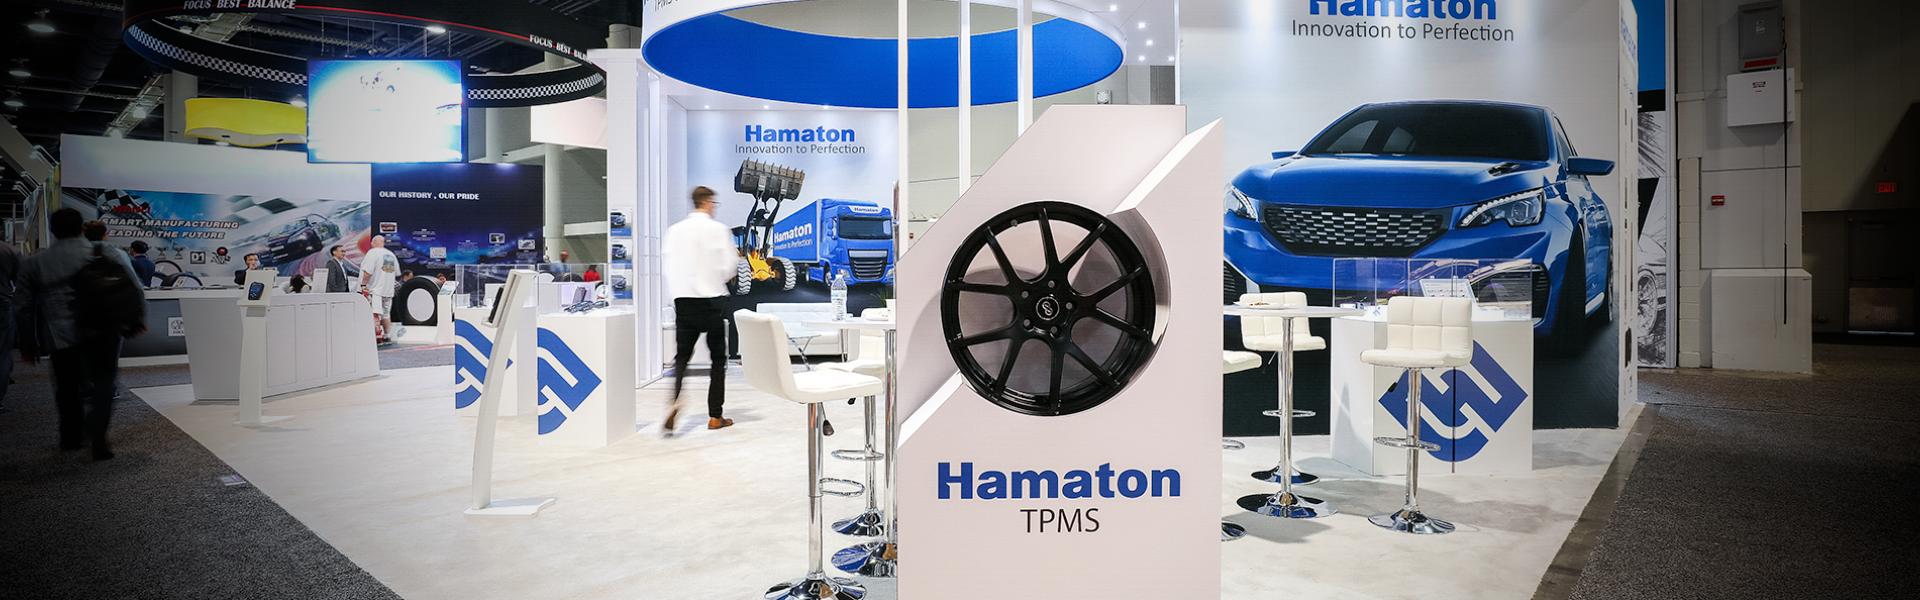 Hamaton Inc